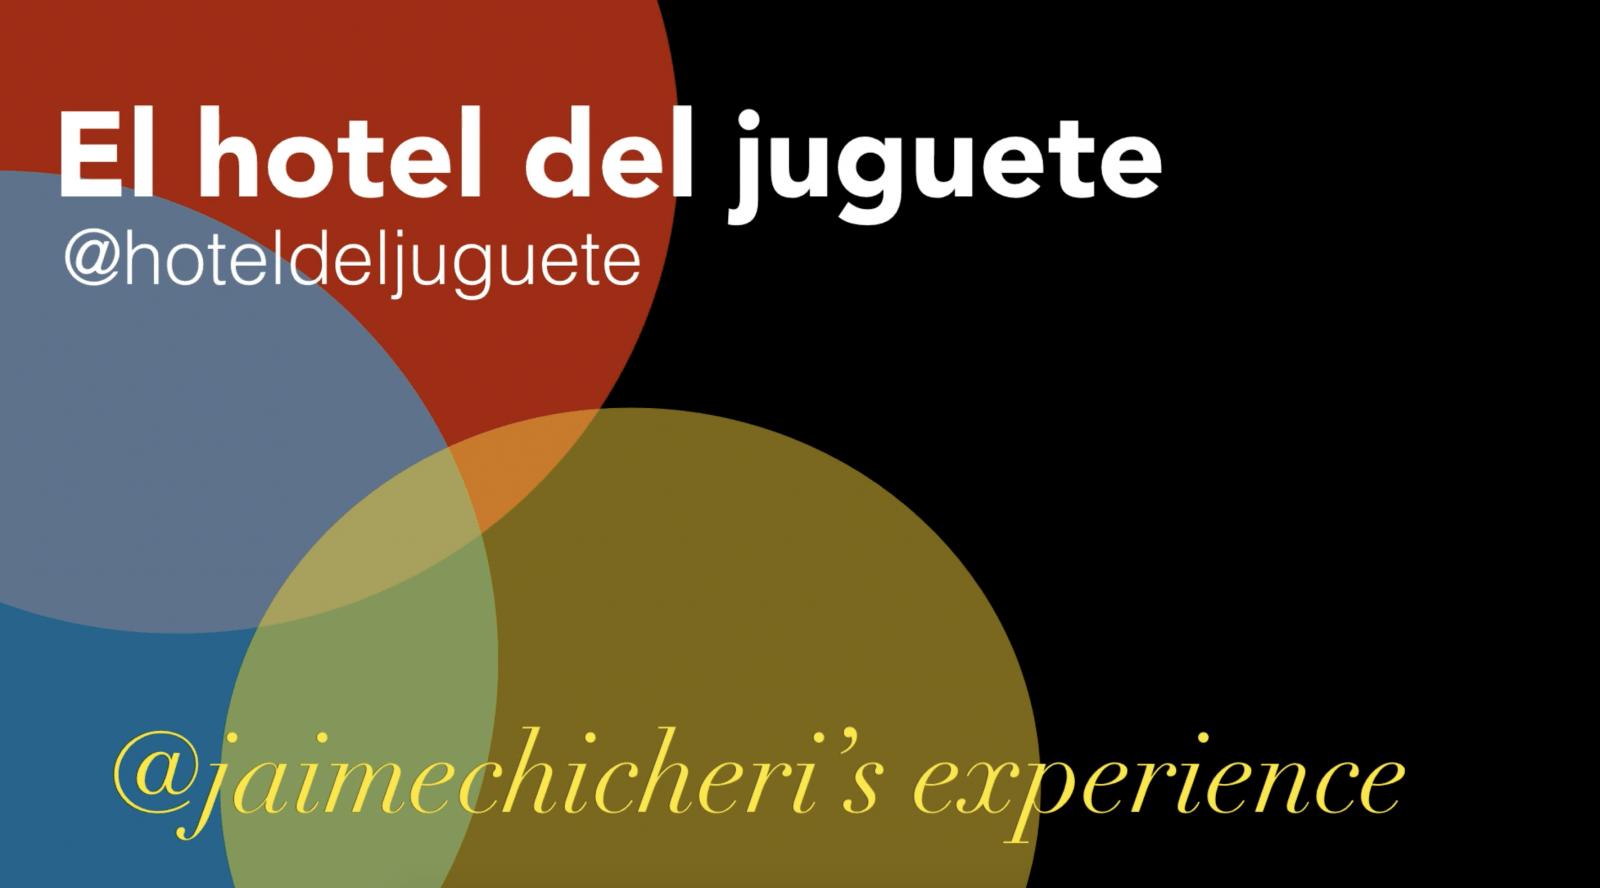 El hotel del juguete: jaime chicheri's experience